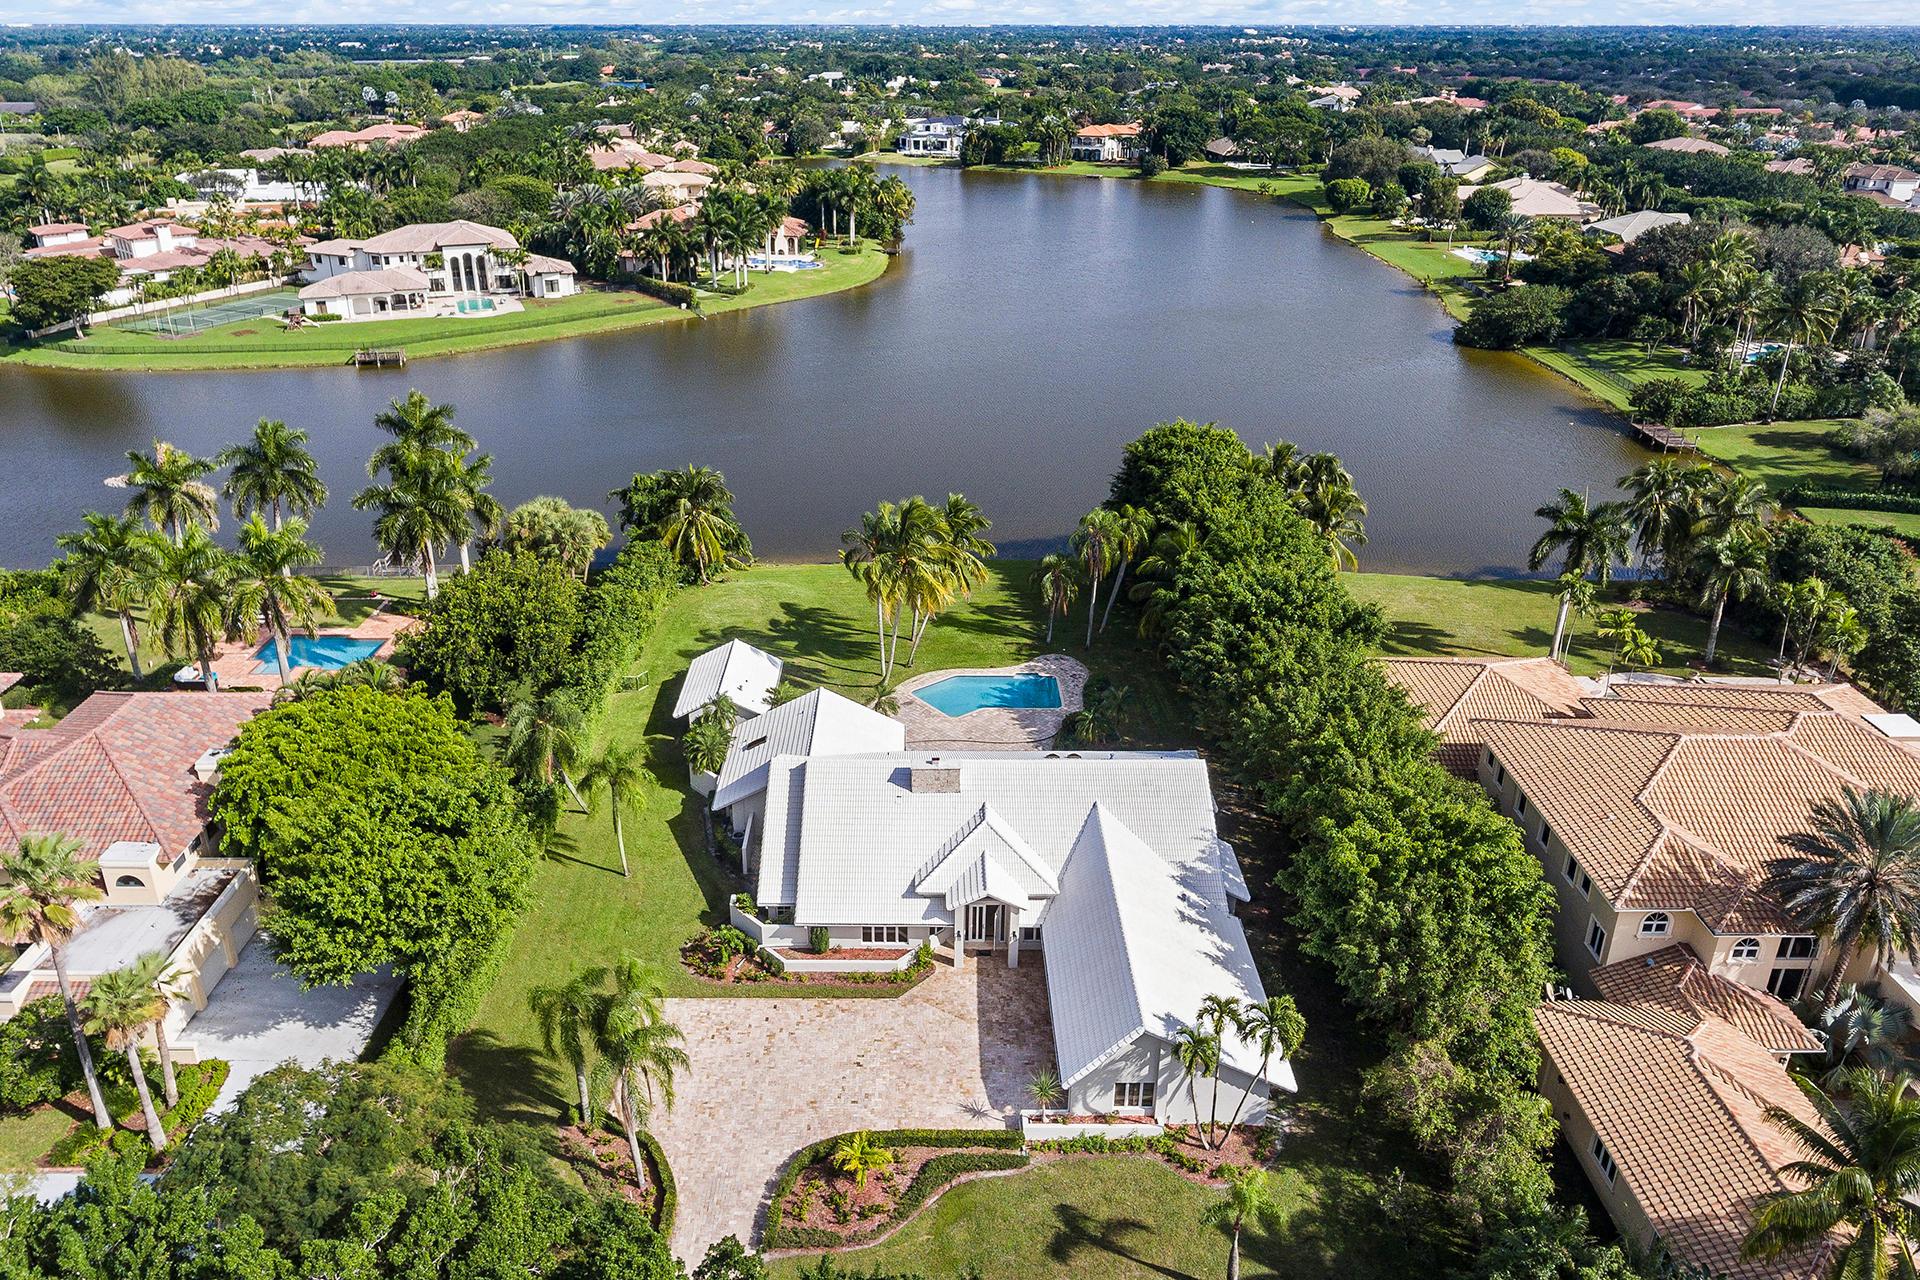 Boca Raton: Long Lake Estates - listed at 1,495,000 (18723 Long Lake Dr)